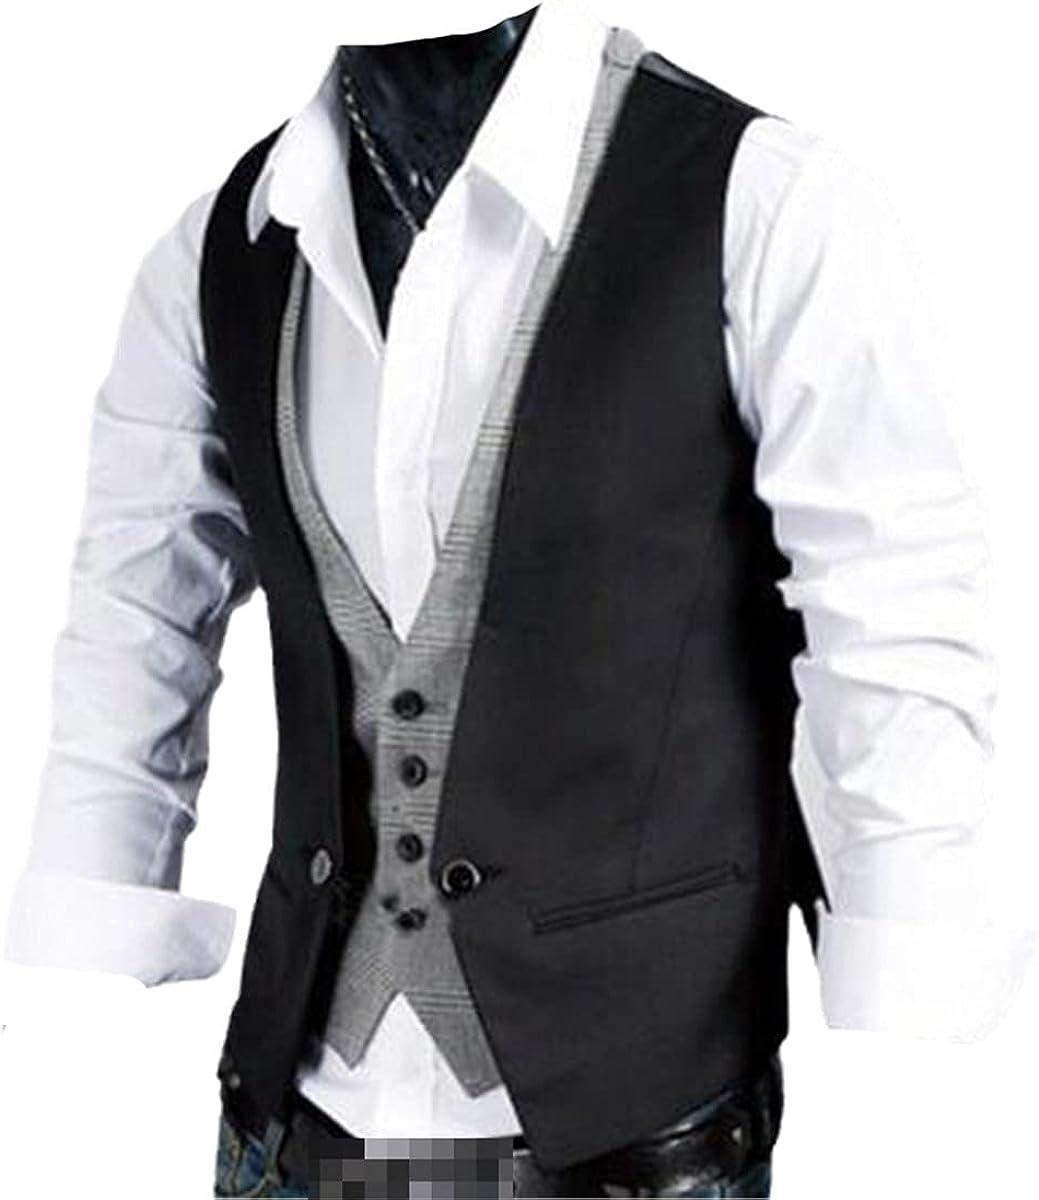 Men's formal vest vest business solid color single button vest vest fake two-piece V-neck casual slim fit